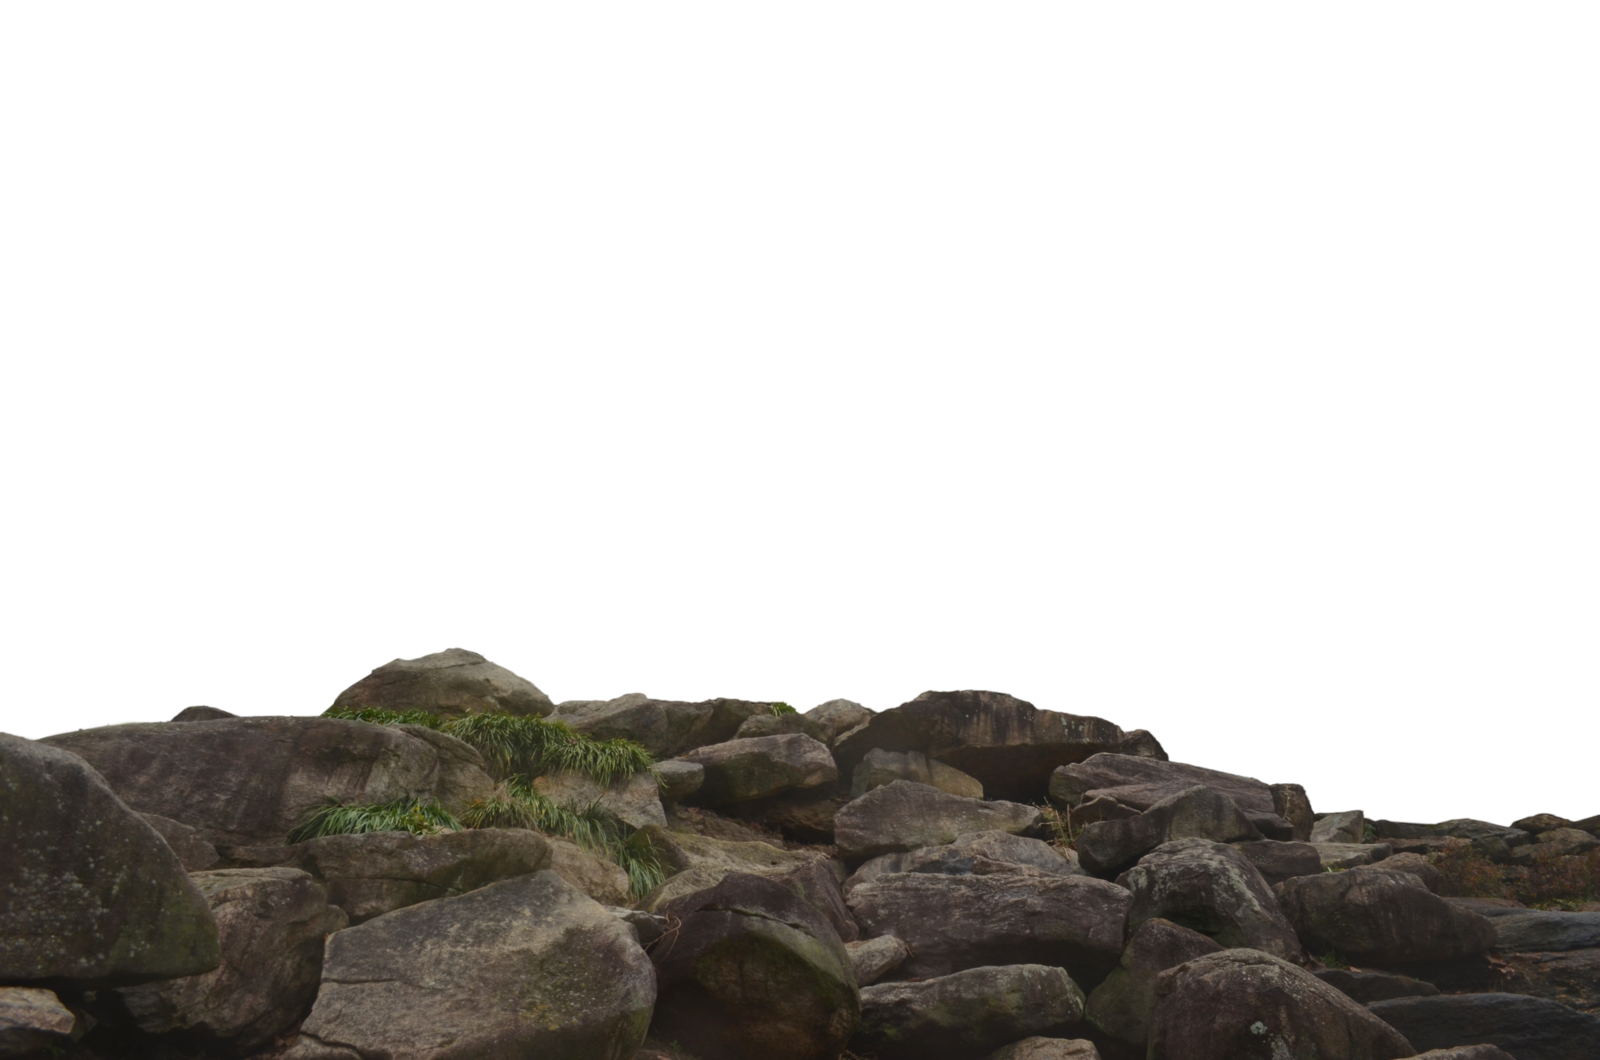 Rock PNG - 11847